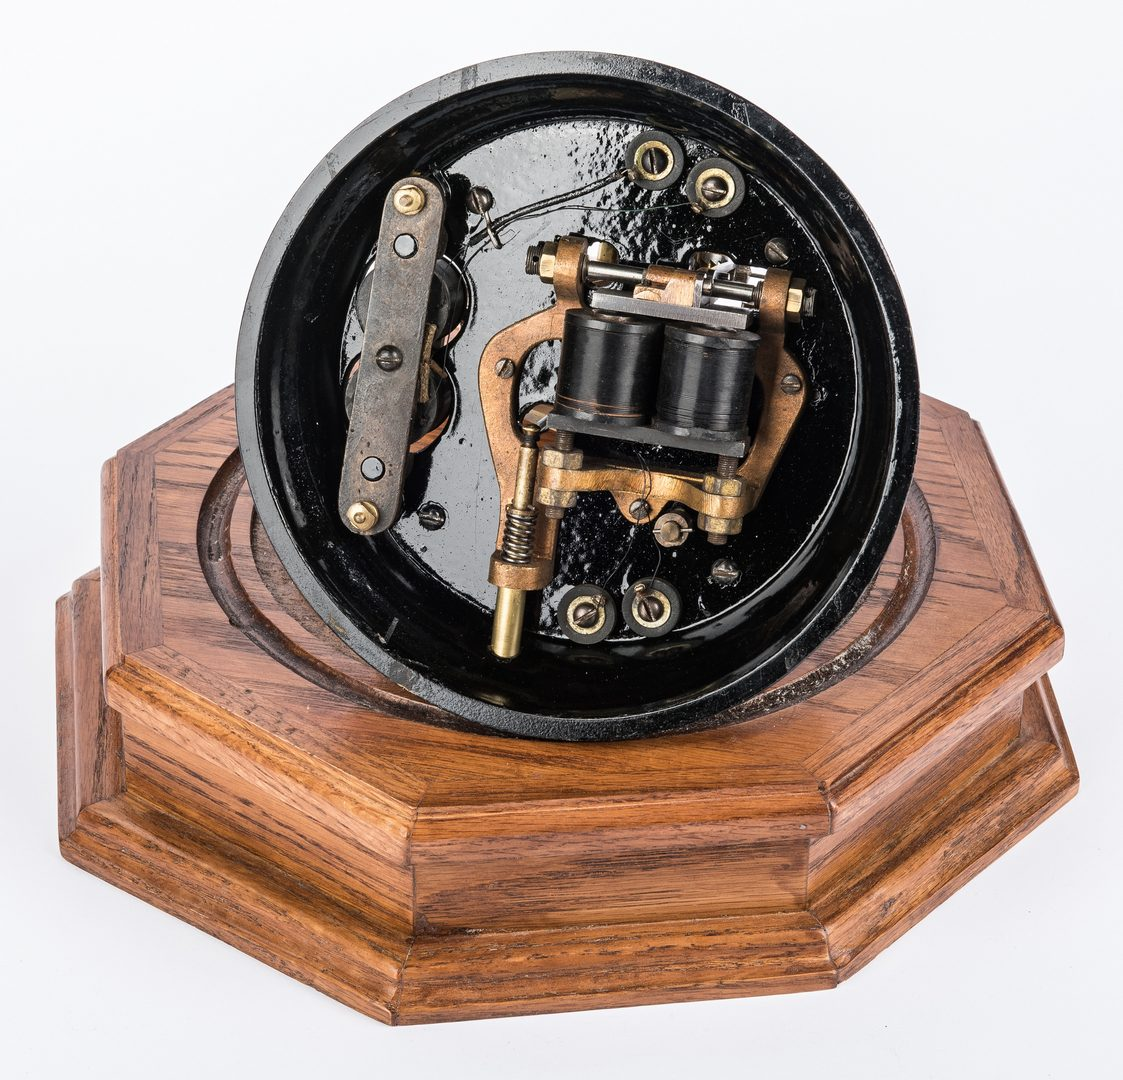 Lot 849: Refurbished Western Union Model 3-A Ticker Tape Machine